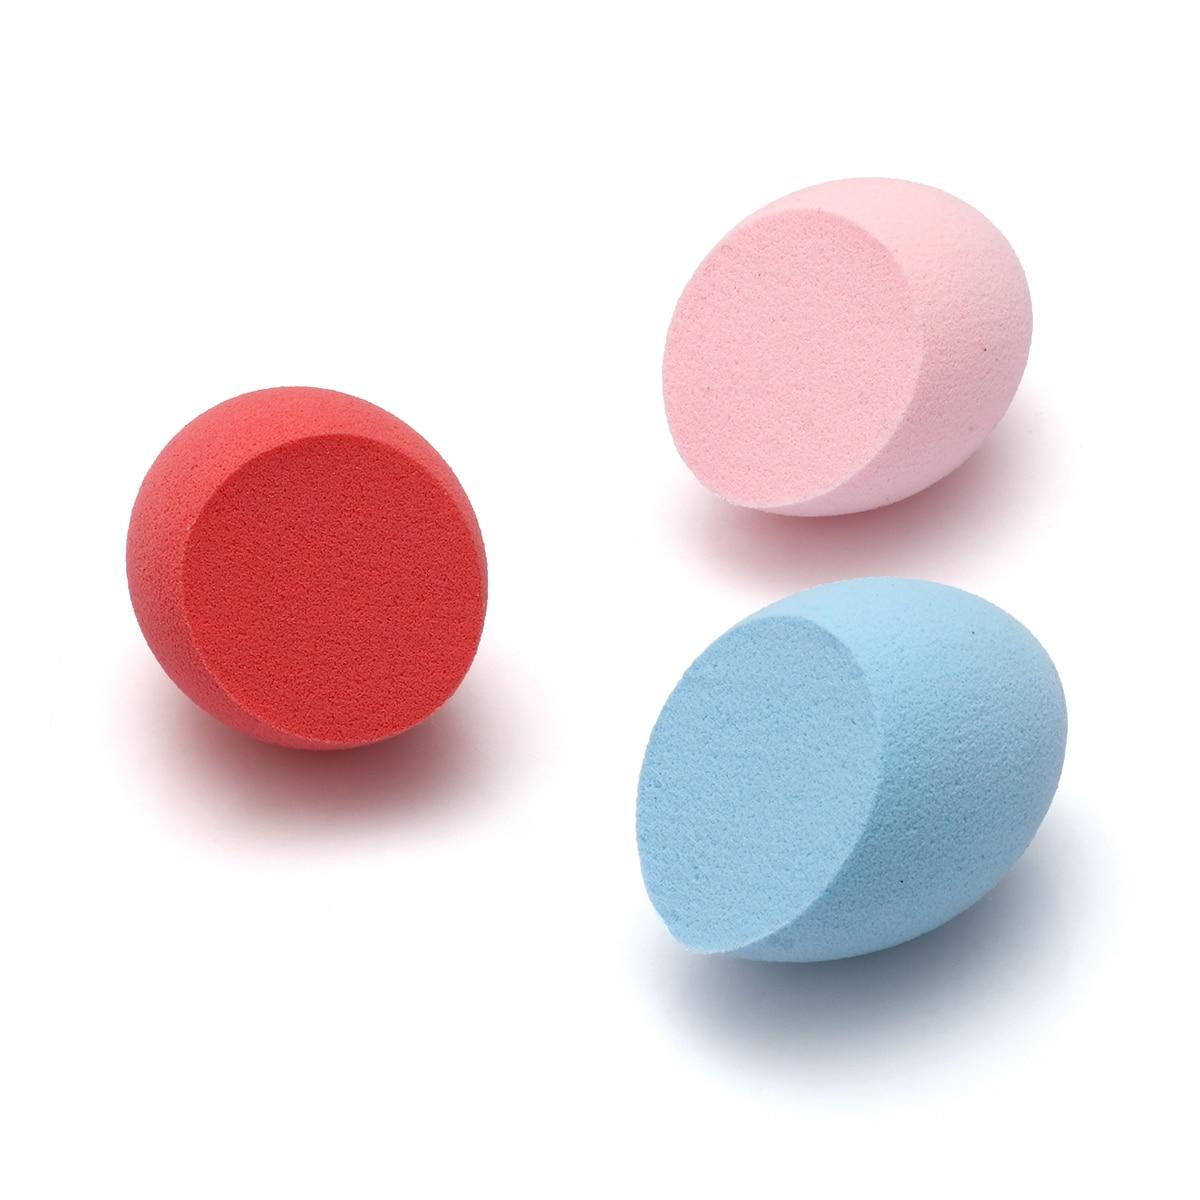 1PC Random Color Smooth Makeup Foundation Sponge Blender Blending Puff Flawless Powder Beauty Tool